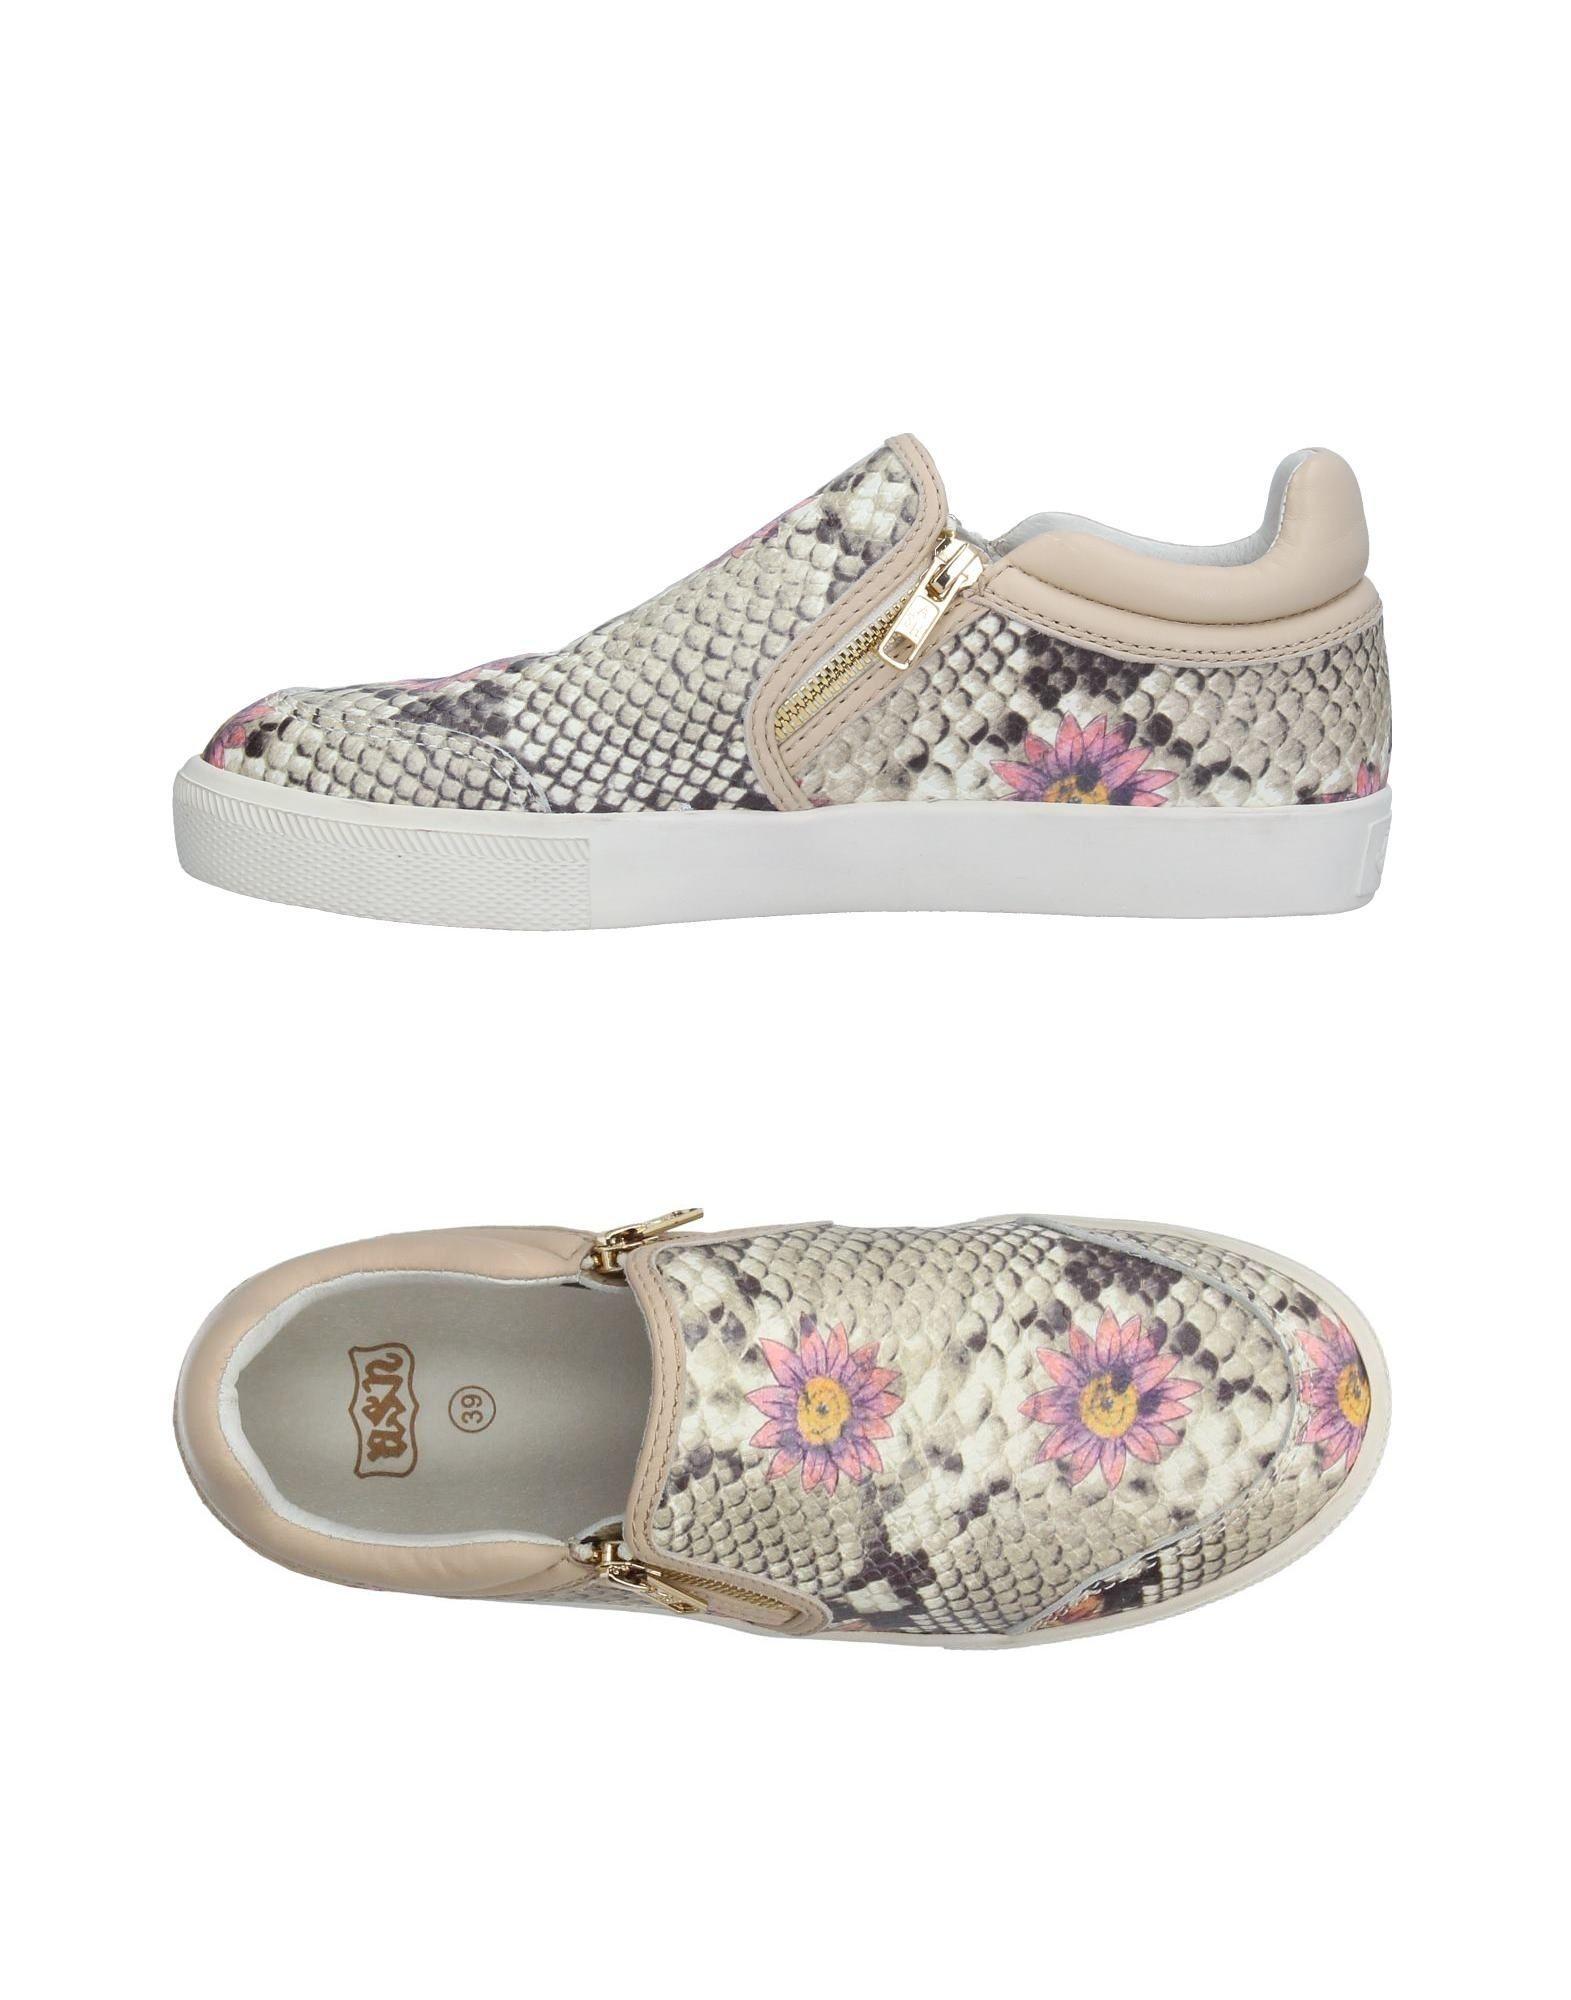 Moda Sneakers Ash Donna Donna Ash - 11211328PL df0930